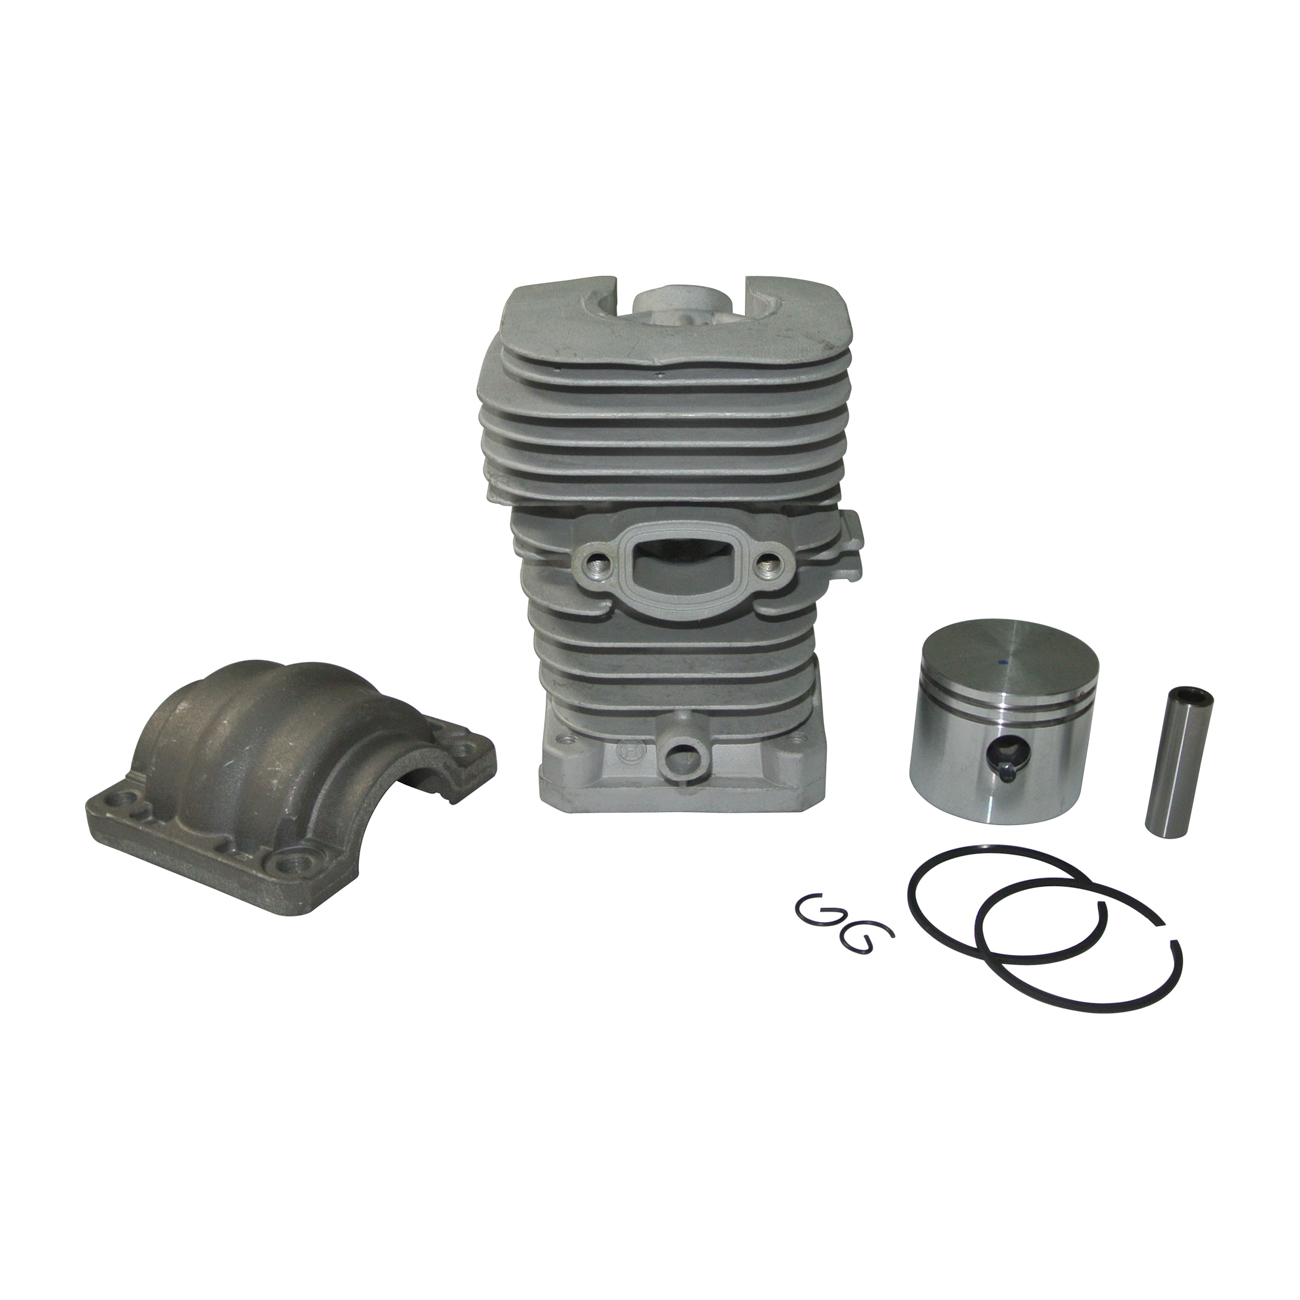 Cylinder Piston For PARTNER 350 351 370 390 420 Poulan 220 221 260 1950 (41mm) цена